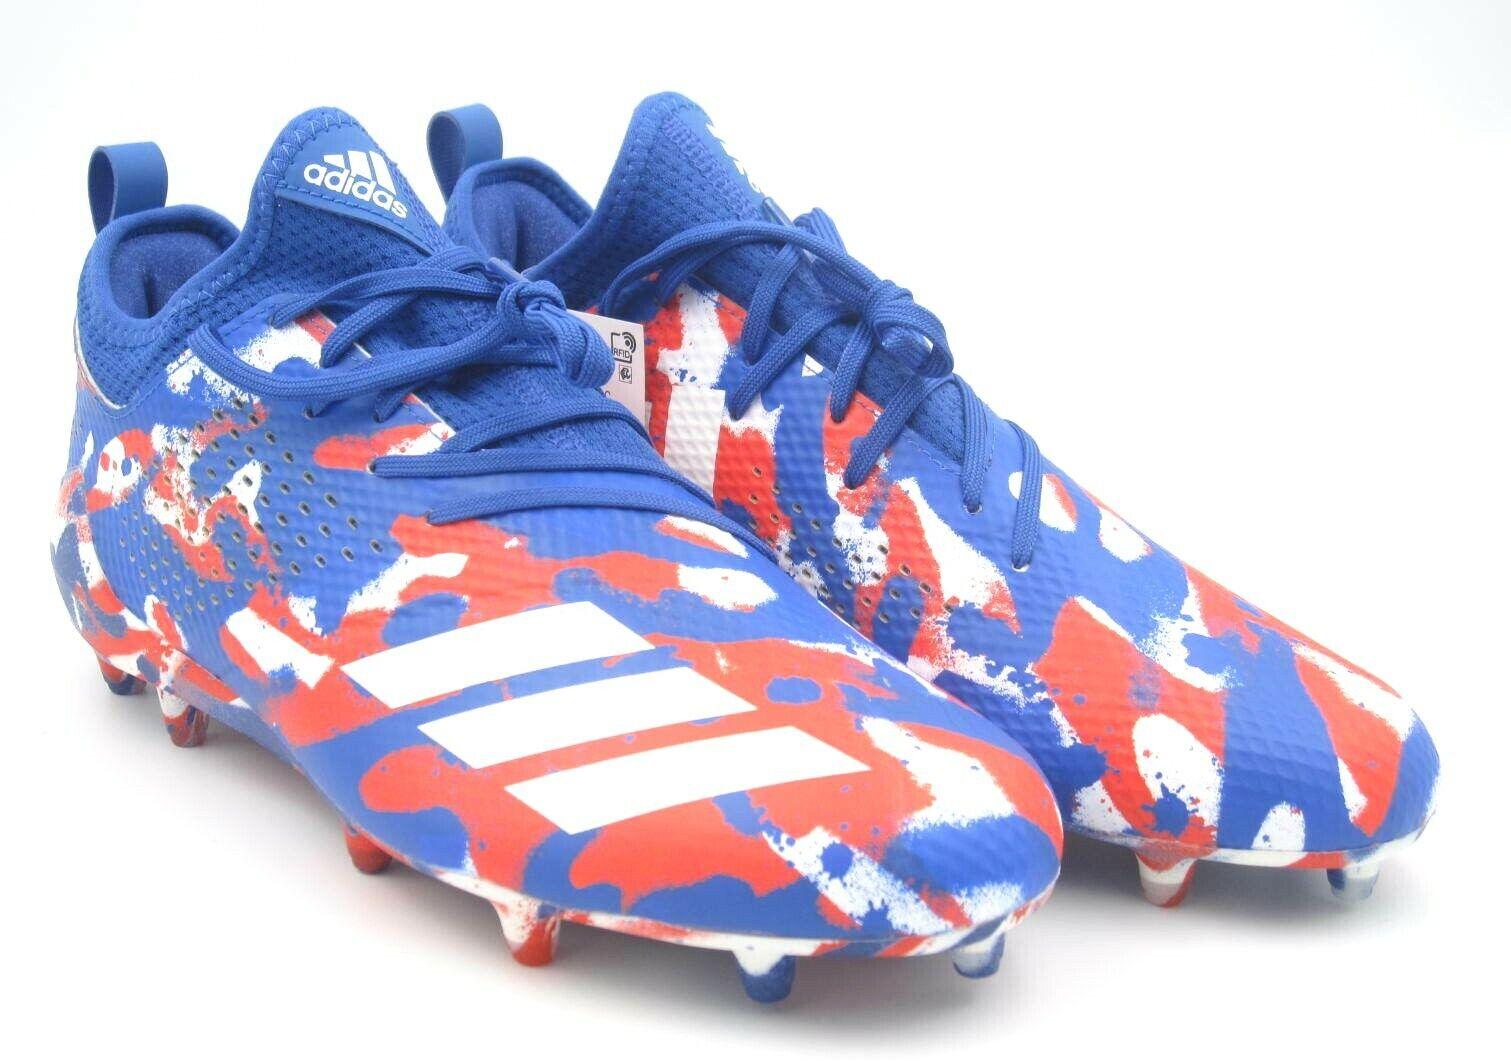 Adidas Adizero 5 Star 7.0 Red bluee White Football Cleats shoes Sz 10US(DB0623)A26